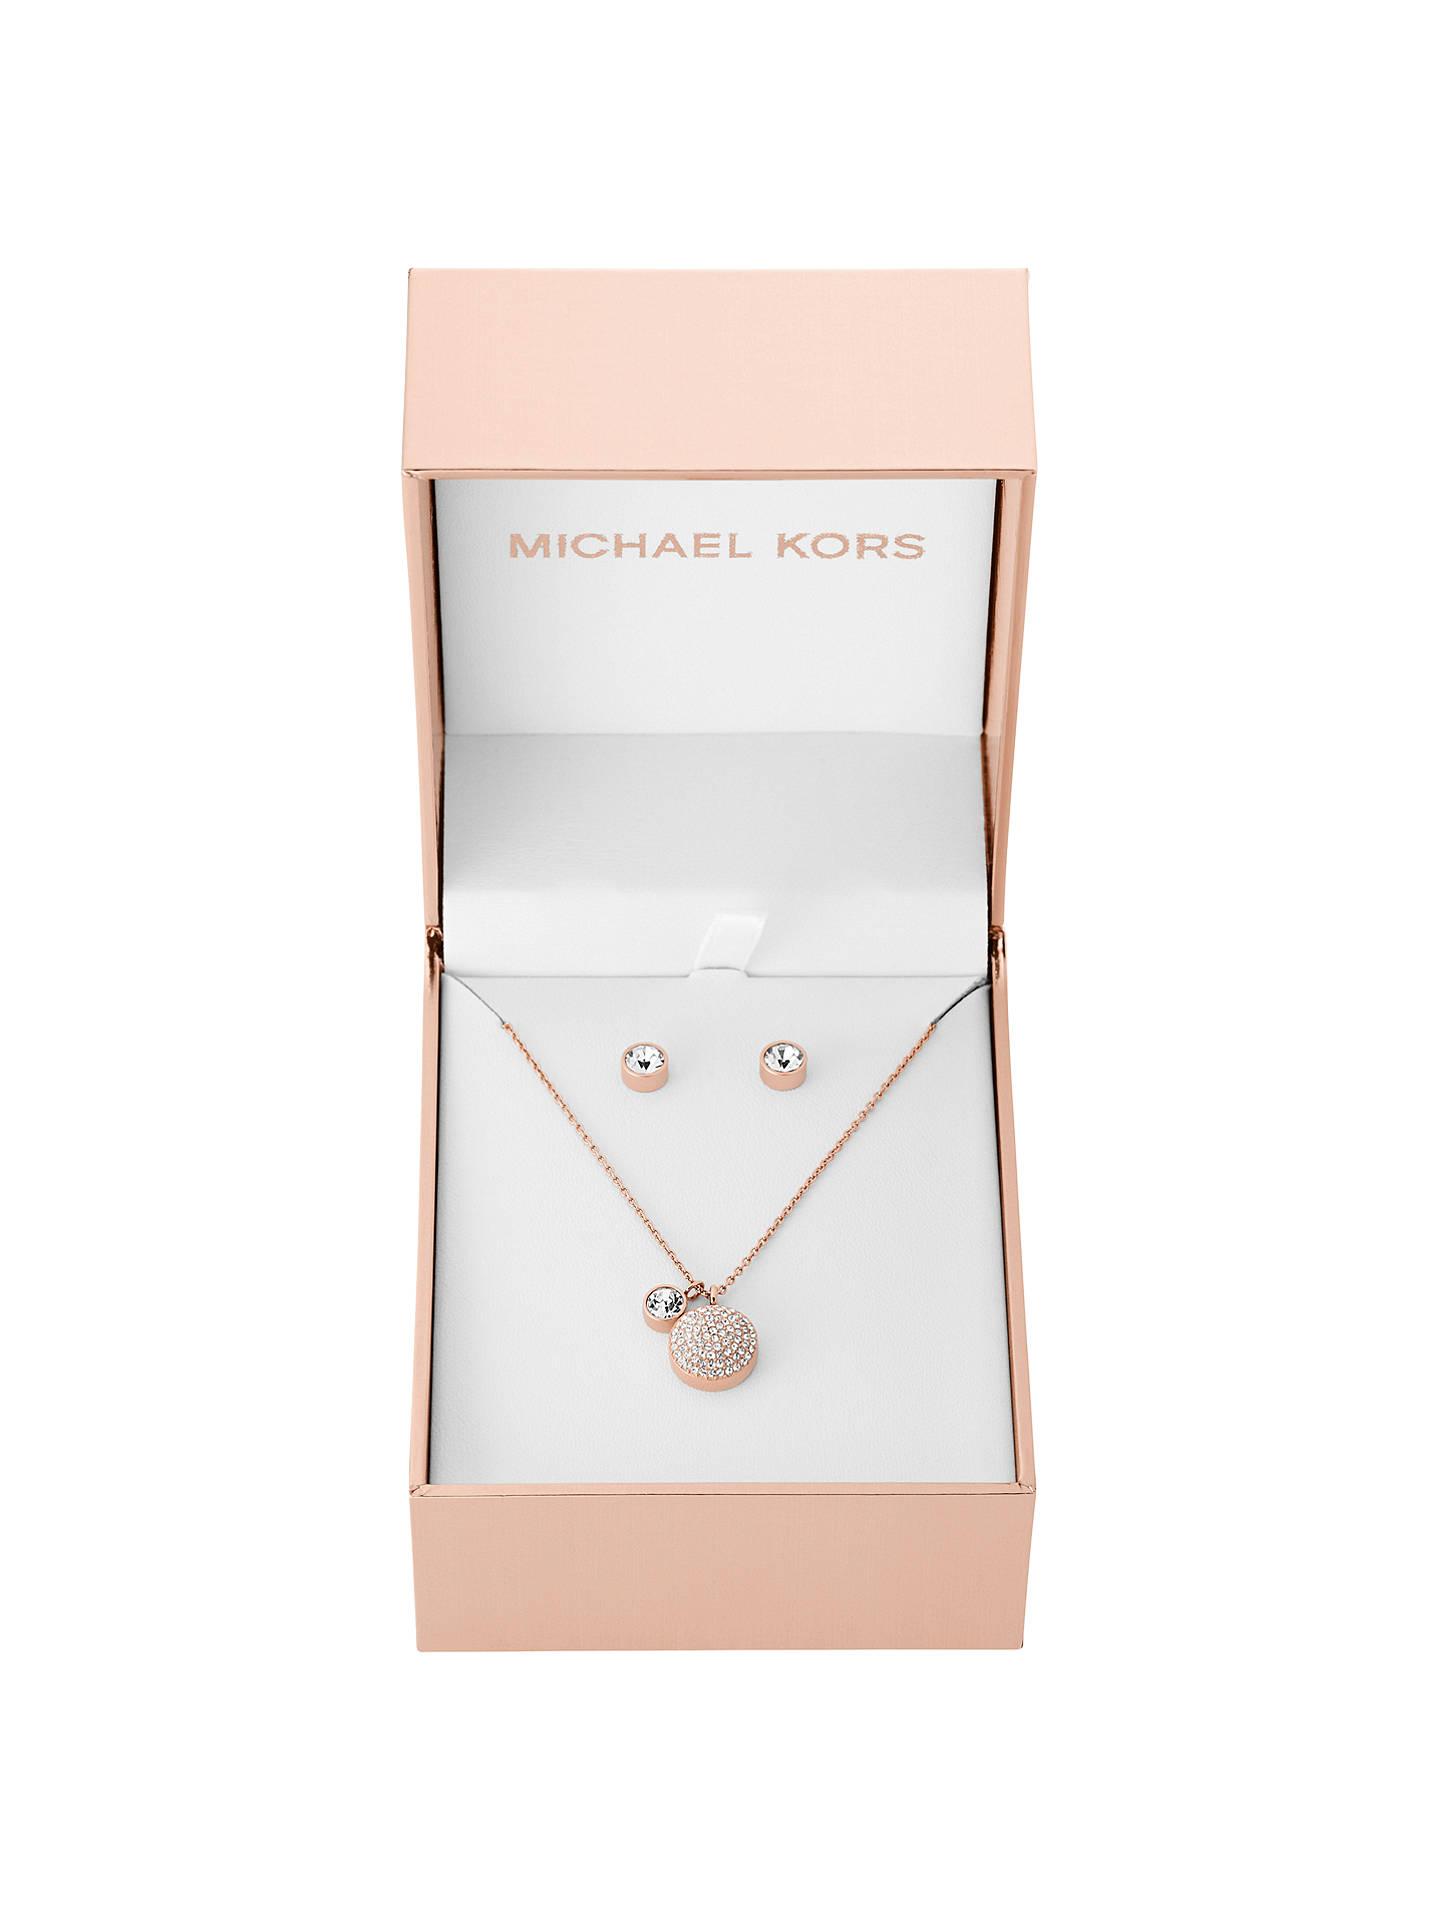 438ae90ea0d9 Buy Michael Kors Pendant Necklace and Stud Earrings Gift Set